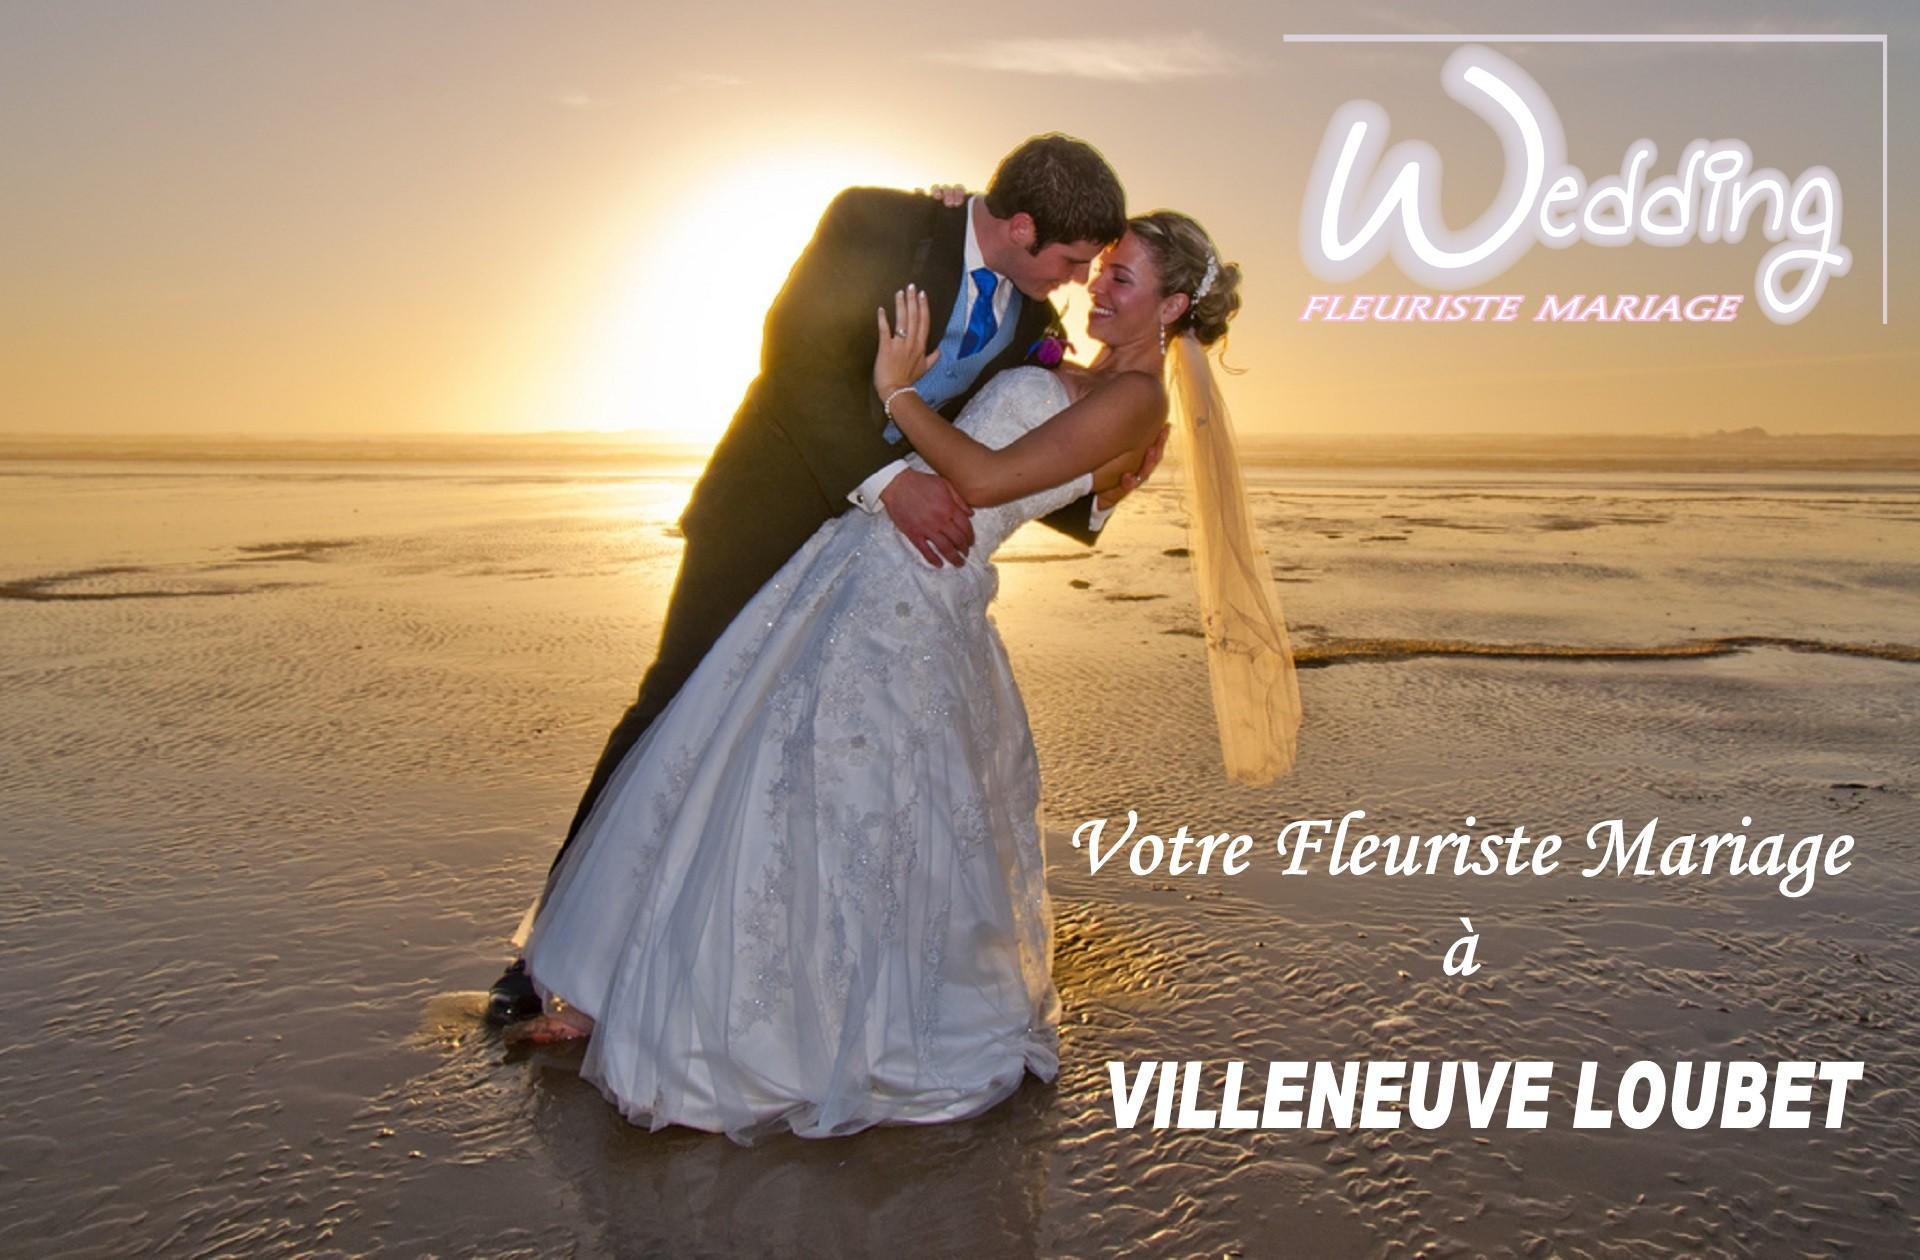 FLEURISTE MARIAGE VILLENEUVE LOUBET - WEDDING PLANNER VILLENEUVE LOUBET - TRAITEUR VILLENEUVE LOUBET